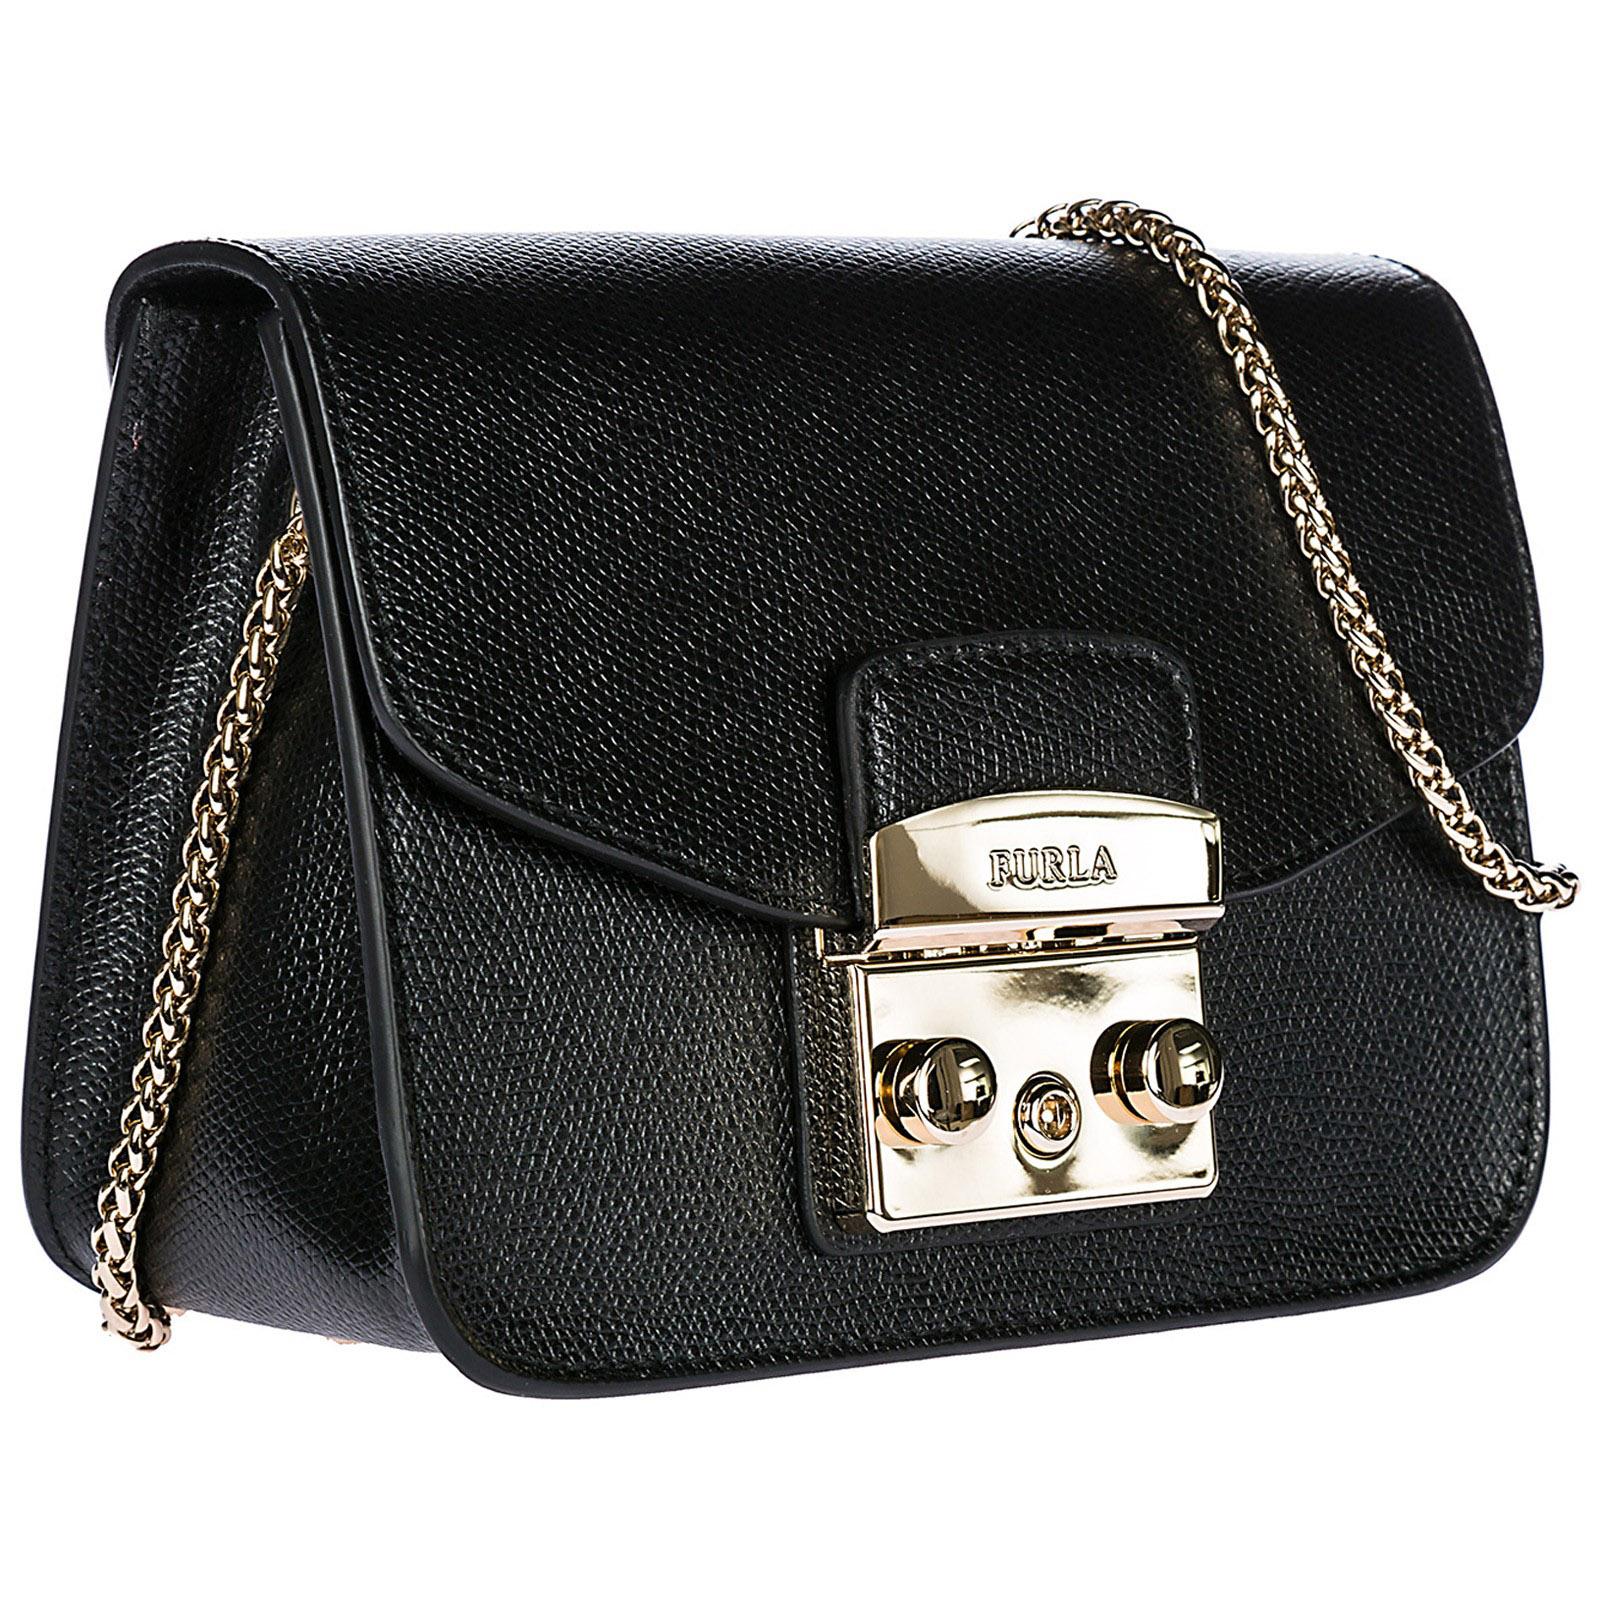 7383d6dd5b60b ... Women s leather cross-body messenger shoulder bag metropolis ...